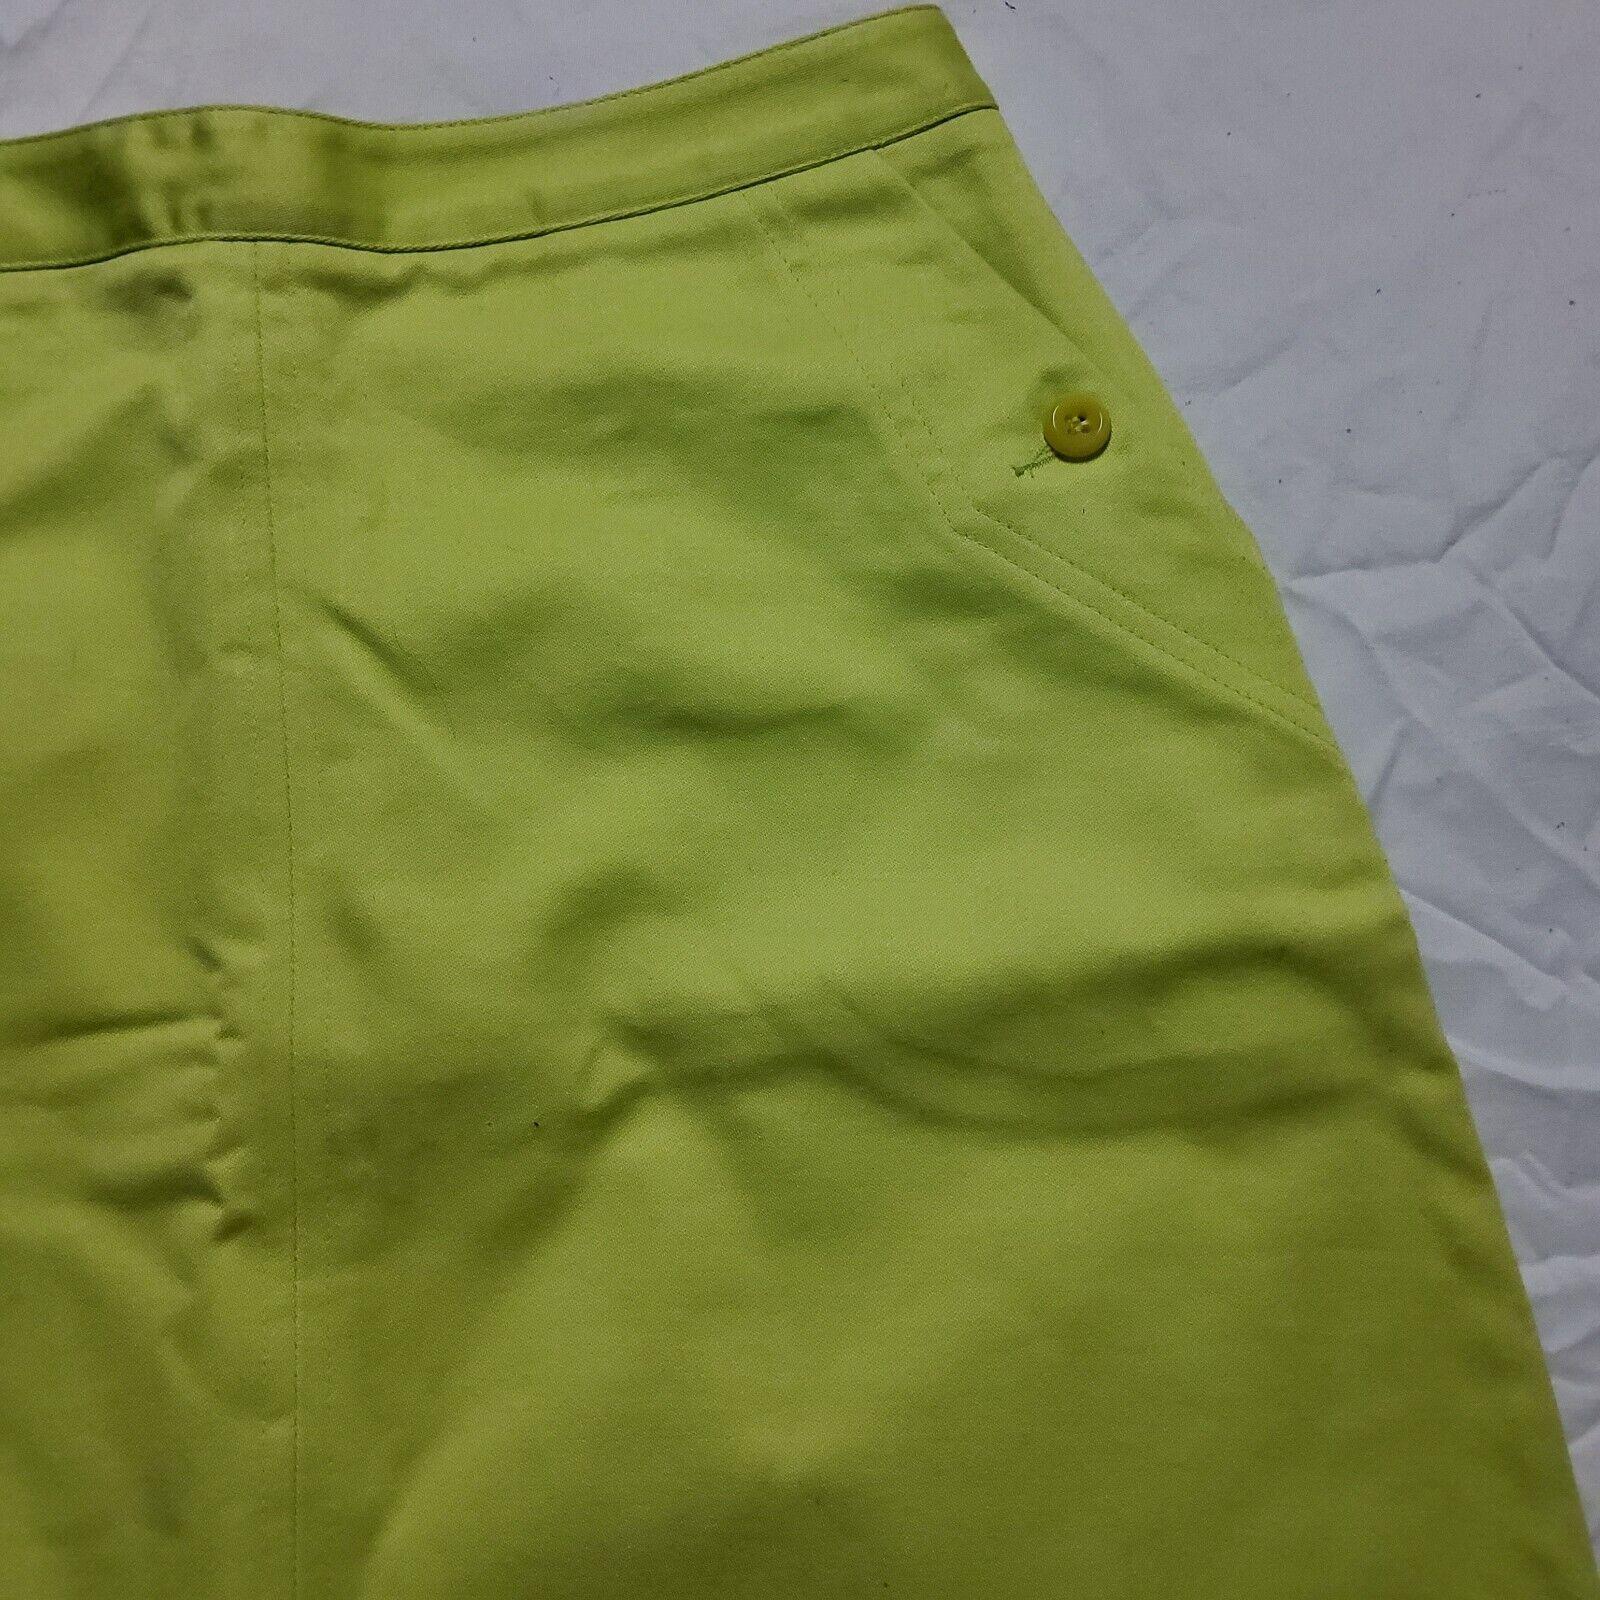 Esprit Neon Green Skirt - image 2